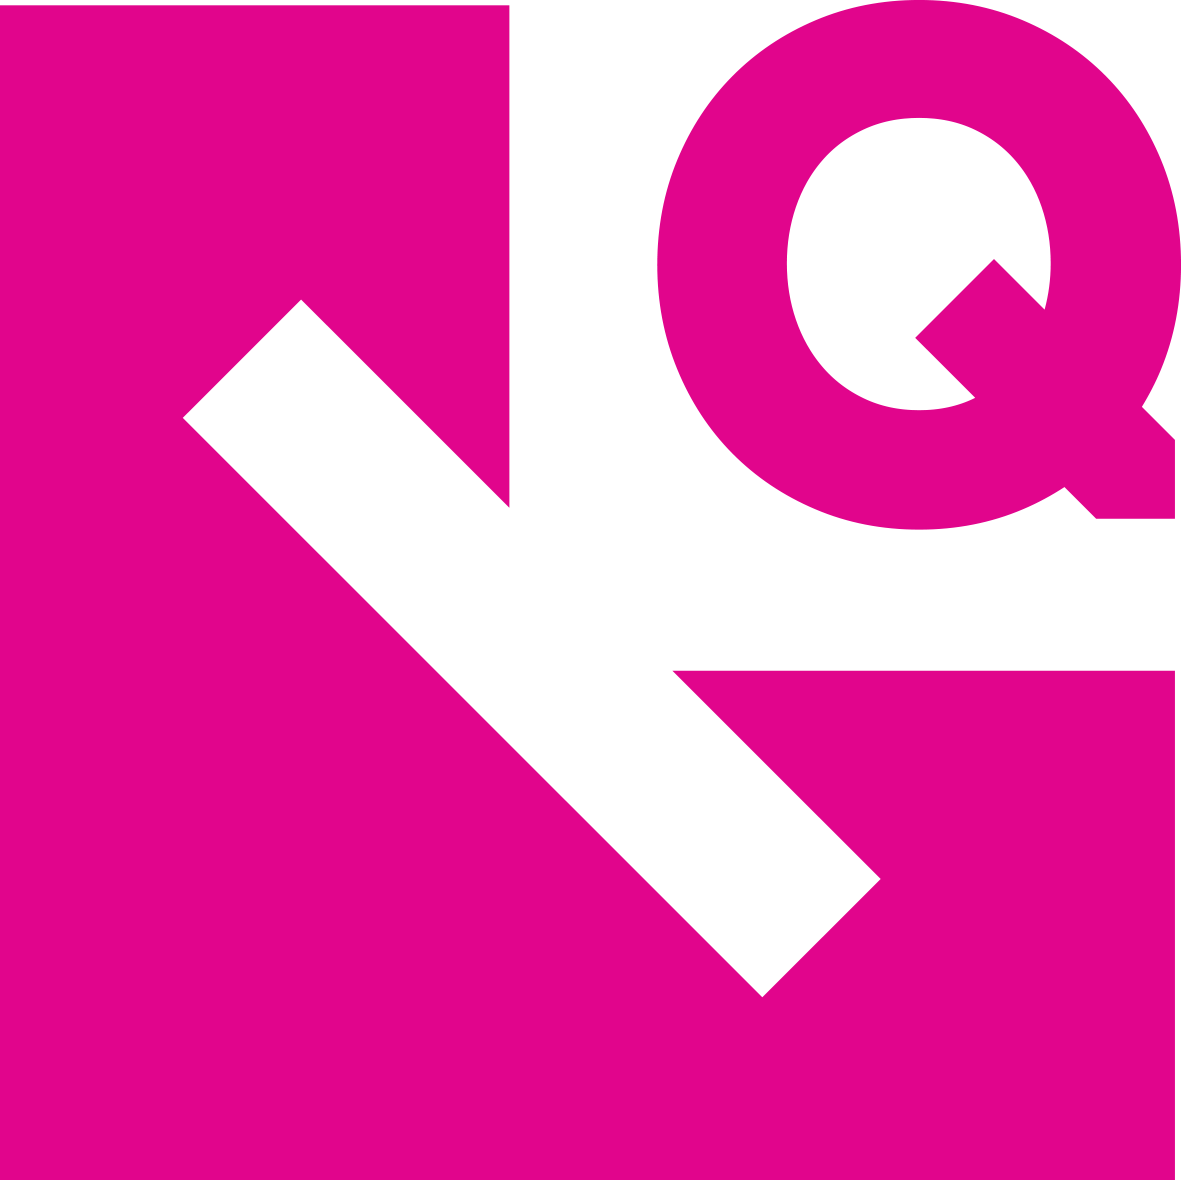 kq-symbol-colour-RGB.png